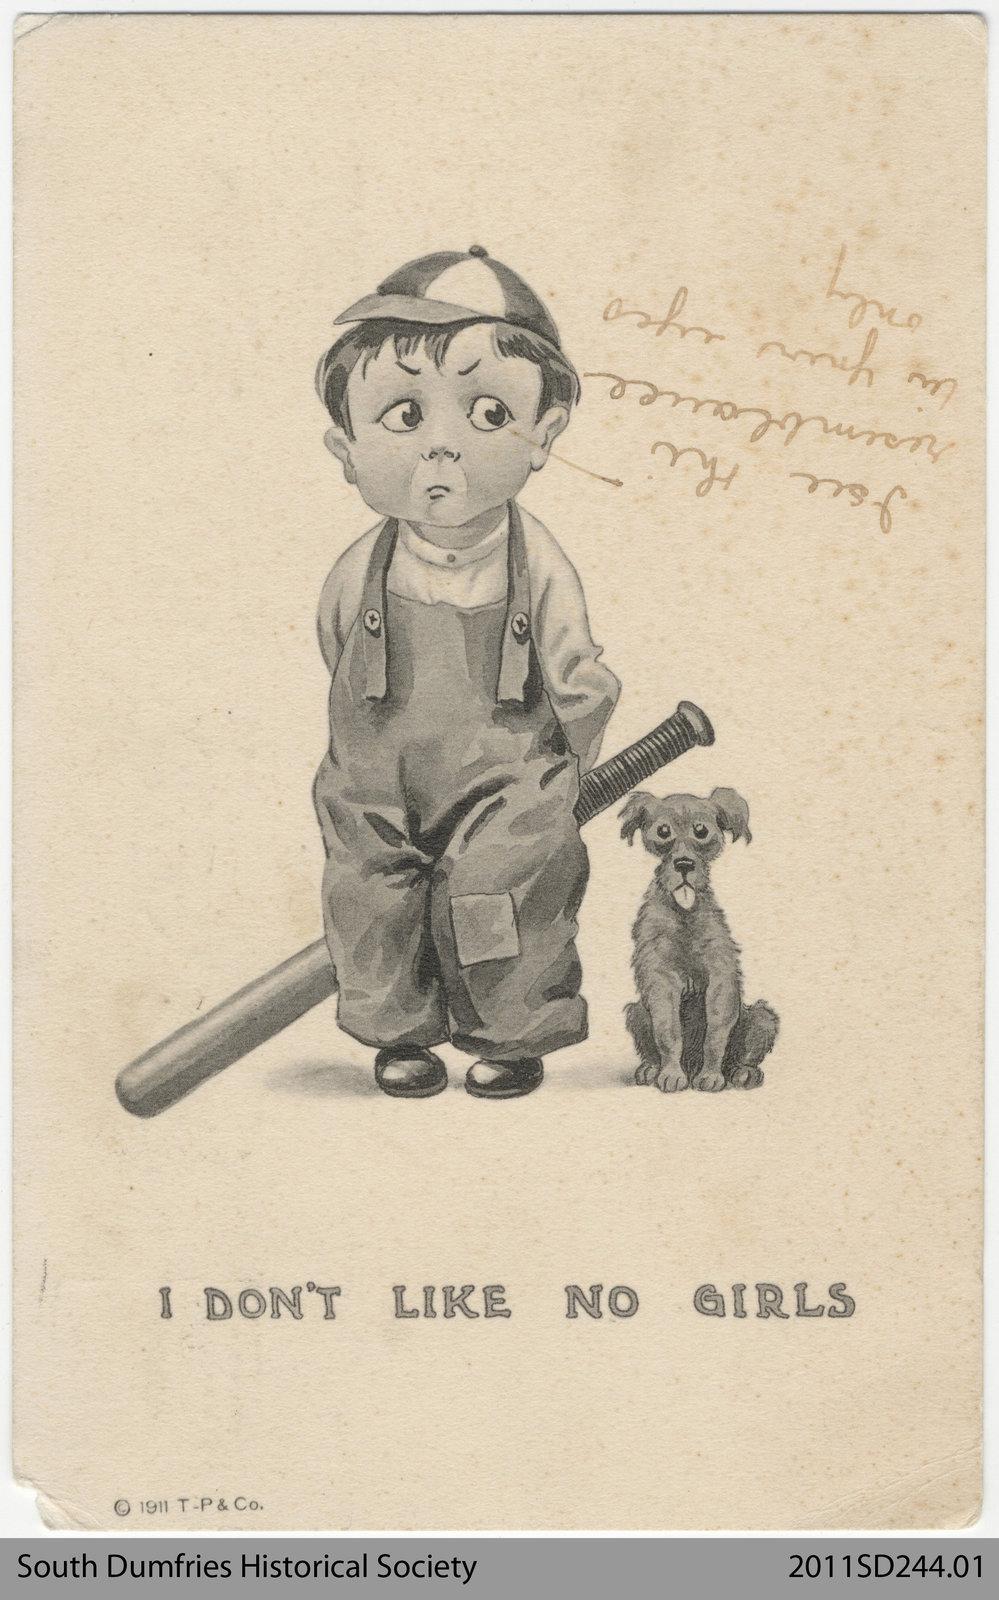 Postcard Addressed to Mr. R.E.W. Lawrason.